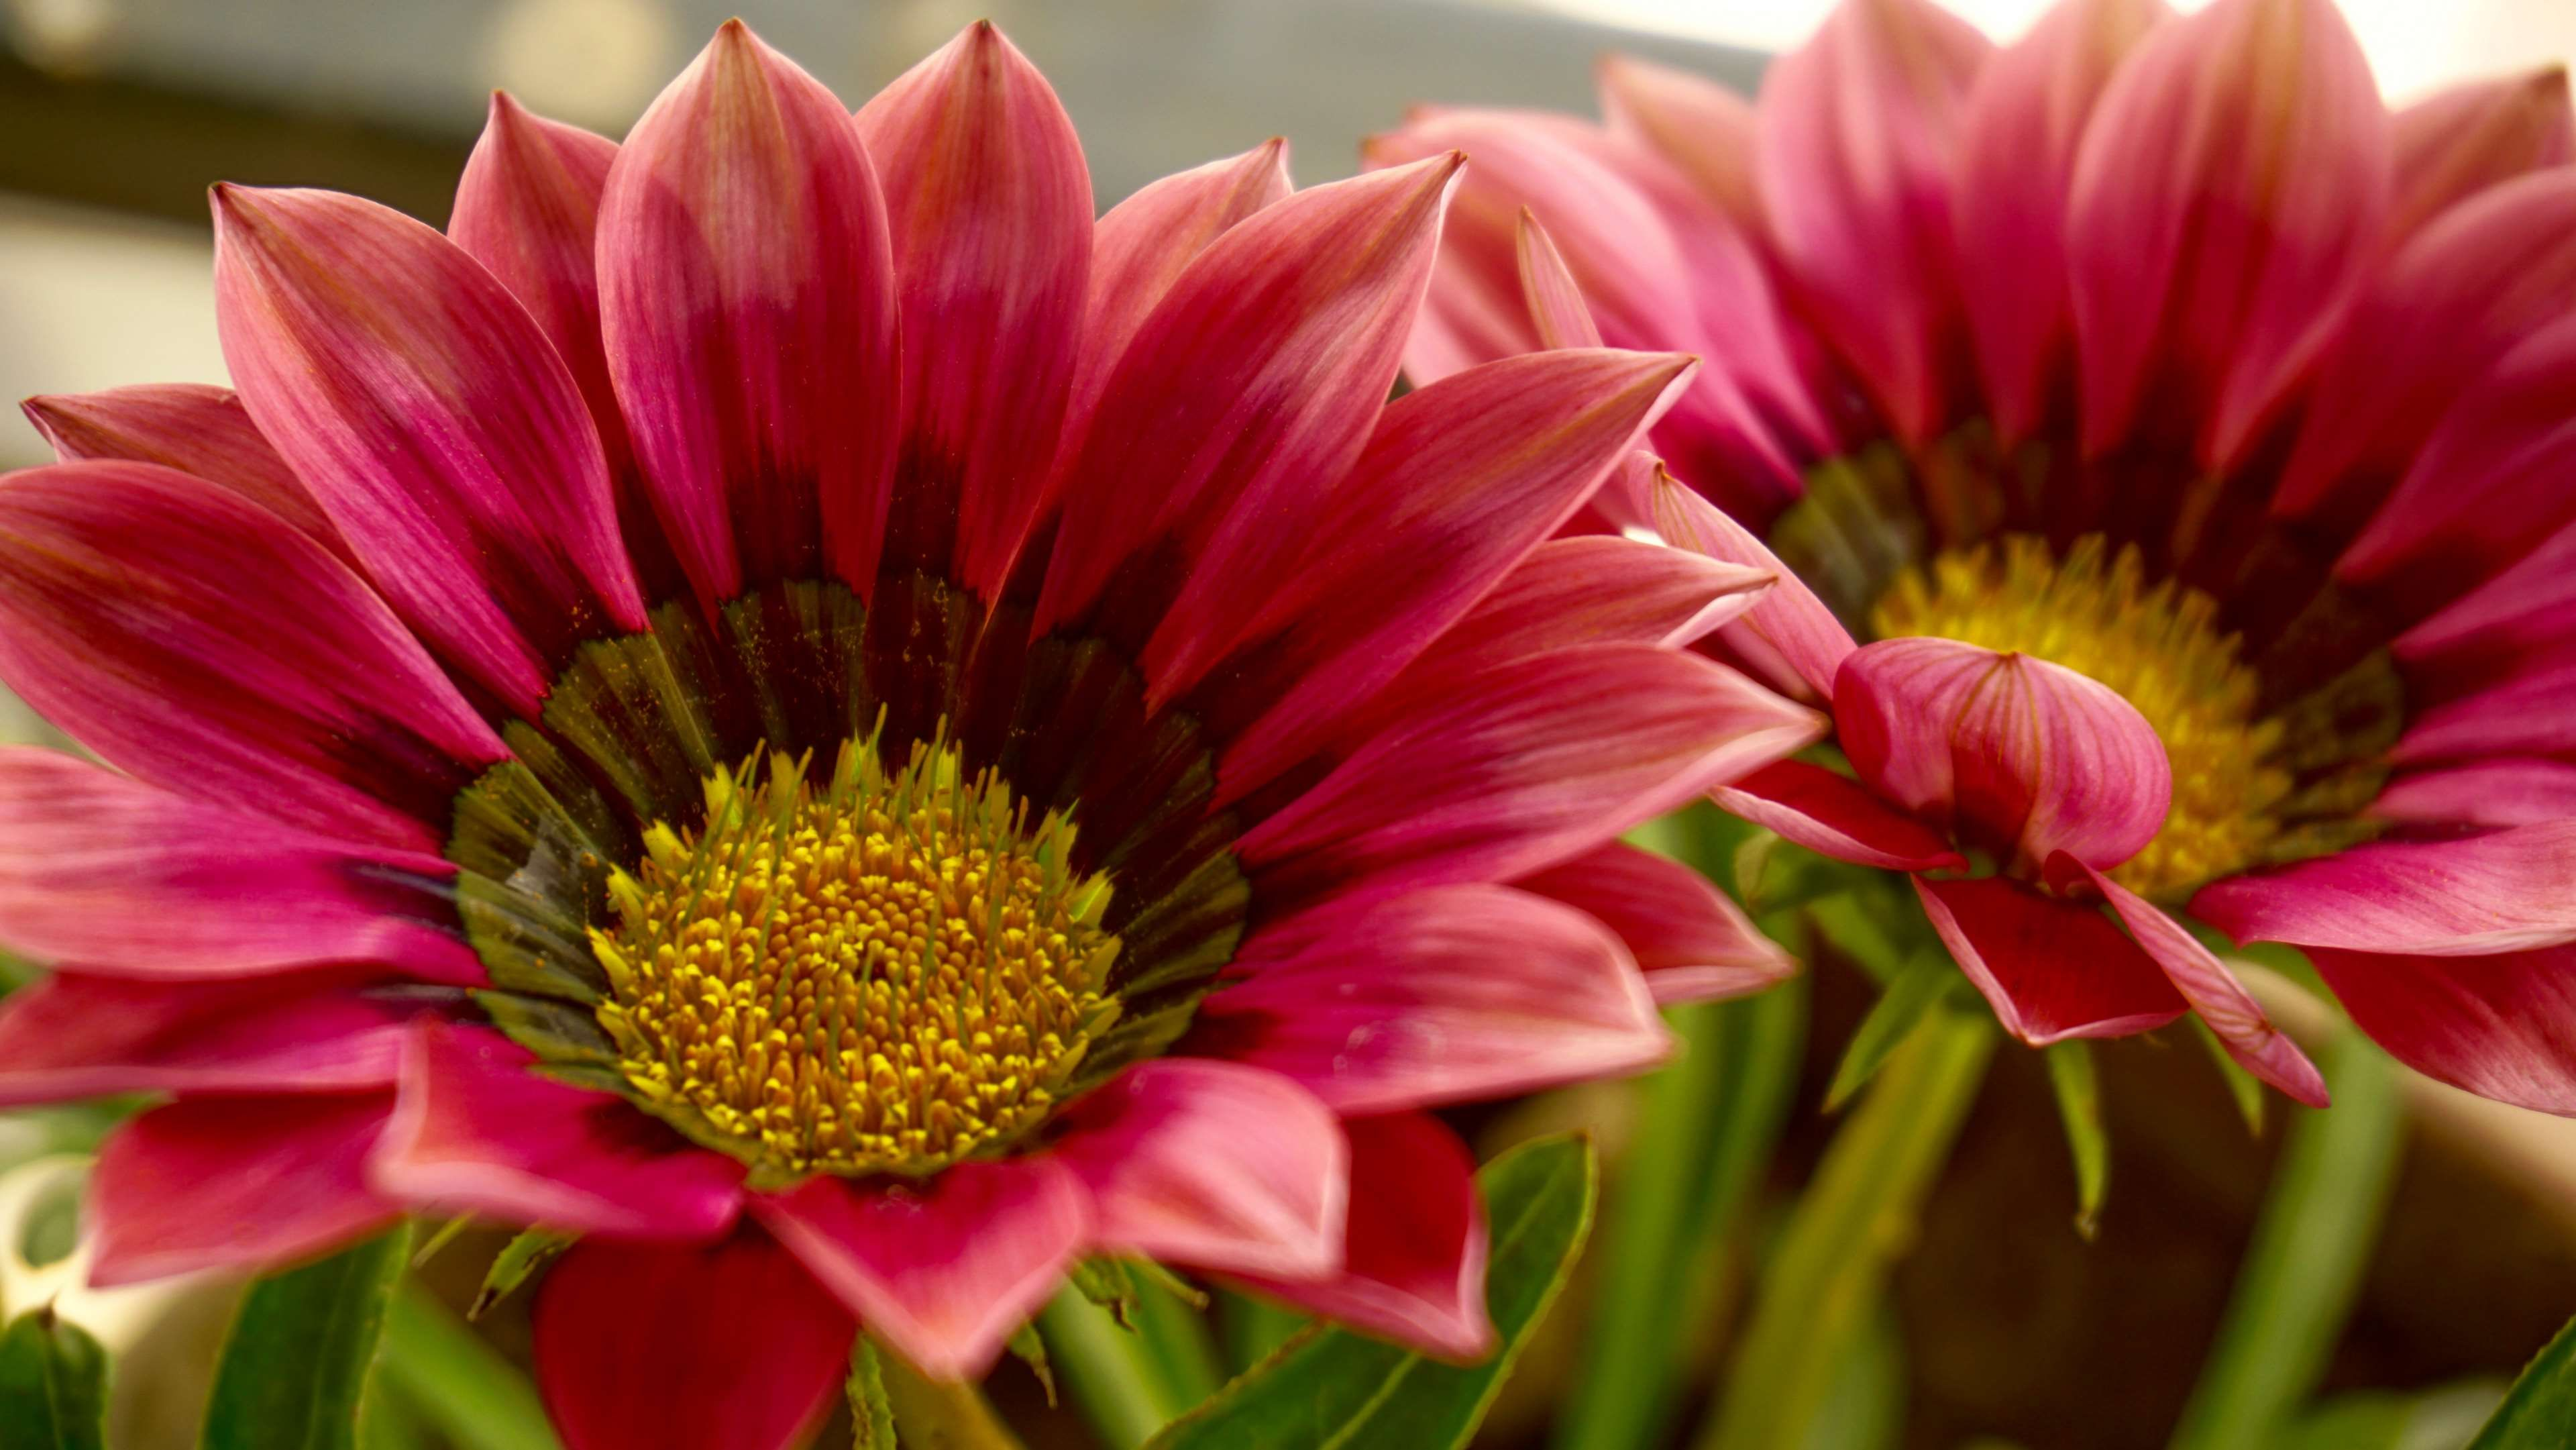 Beautiful beautiful flowers bloom blooming blur close up beautiful beautiful flowers bloom blooming blur close up delicate izmirmasajfo Images